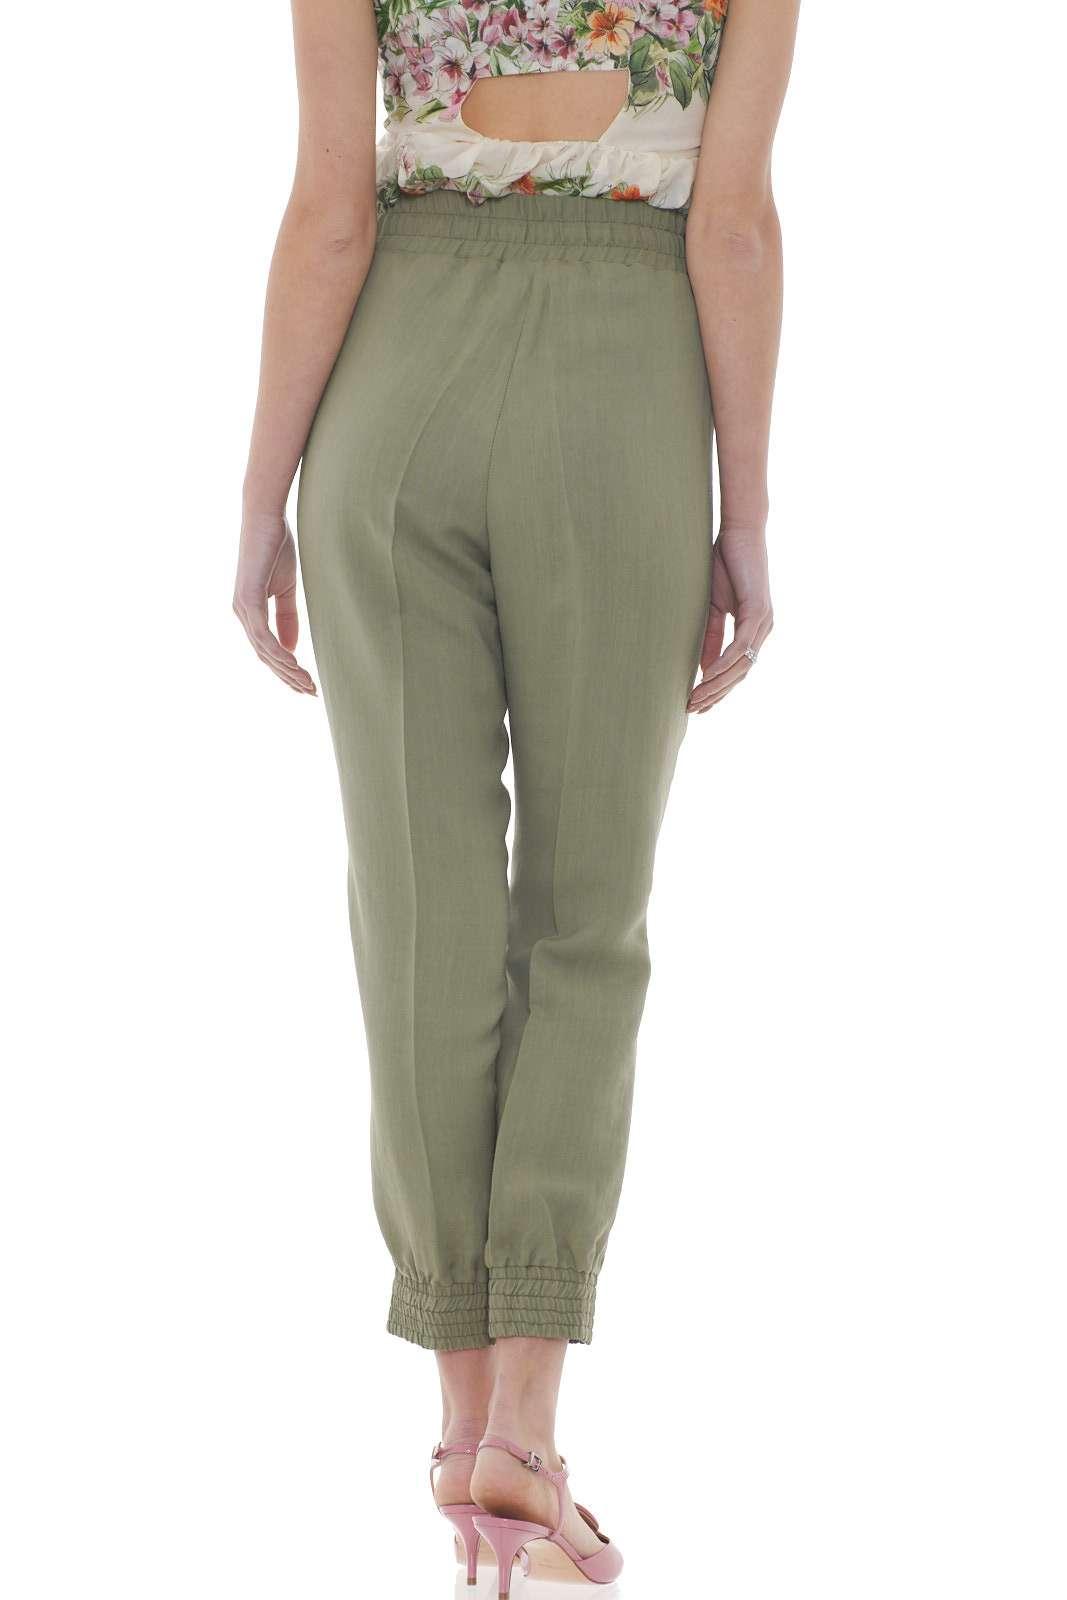 https://www.parmax.com/media/catalog/product/a/i/PE-outlet_parmax-pantaloni-donna-Twin-Set-201TT2215-C.jpg